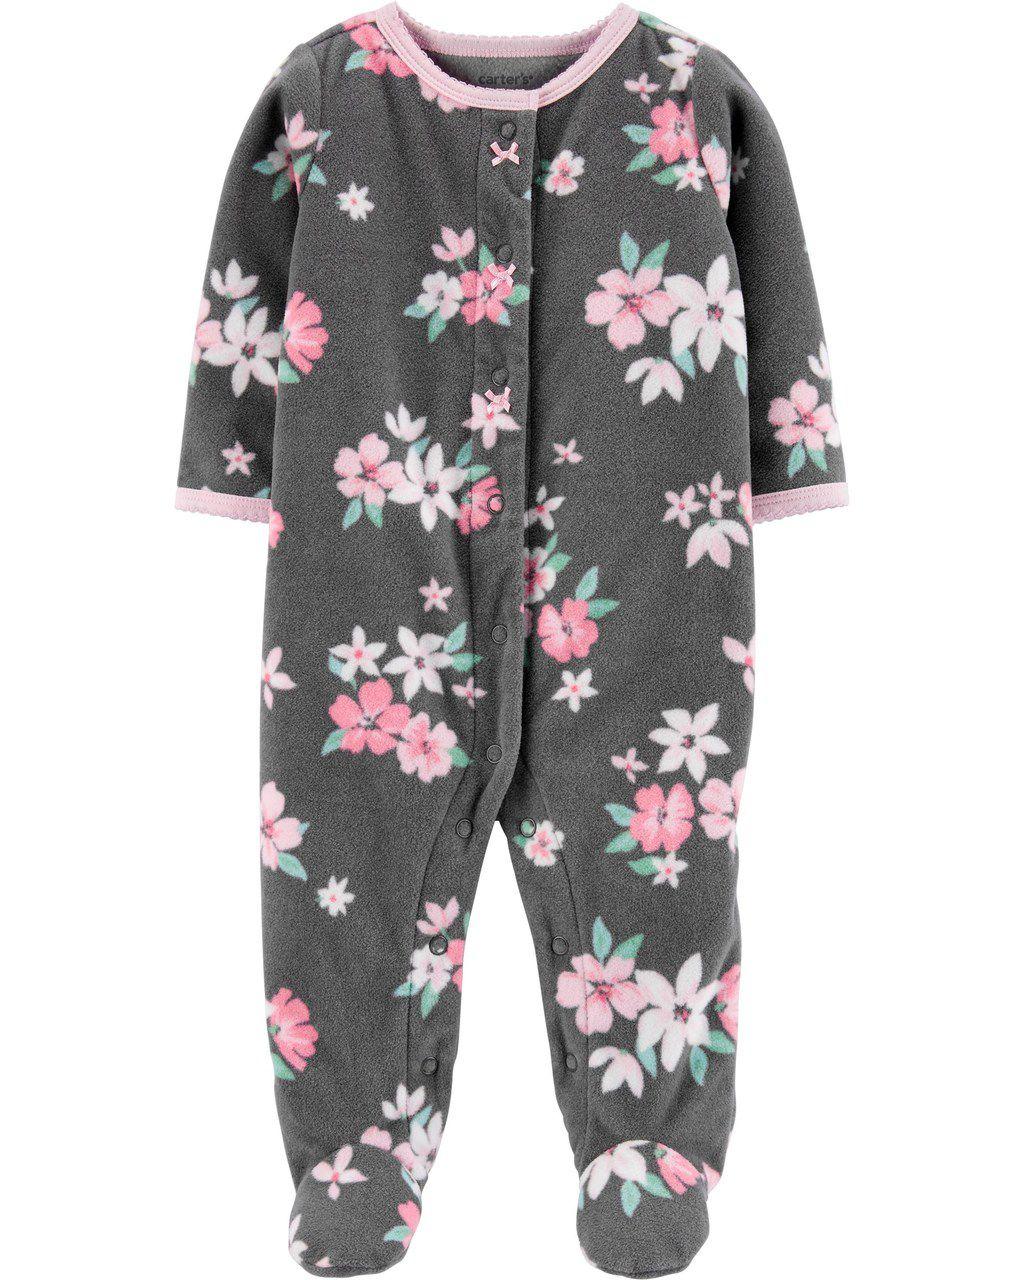 Pijama / Macacão Carters Floral Fleece